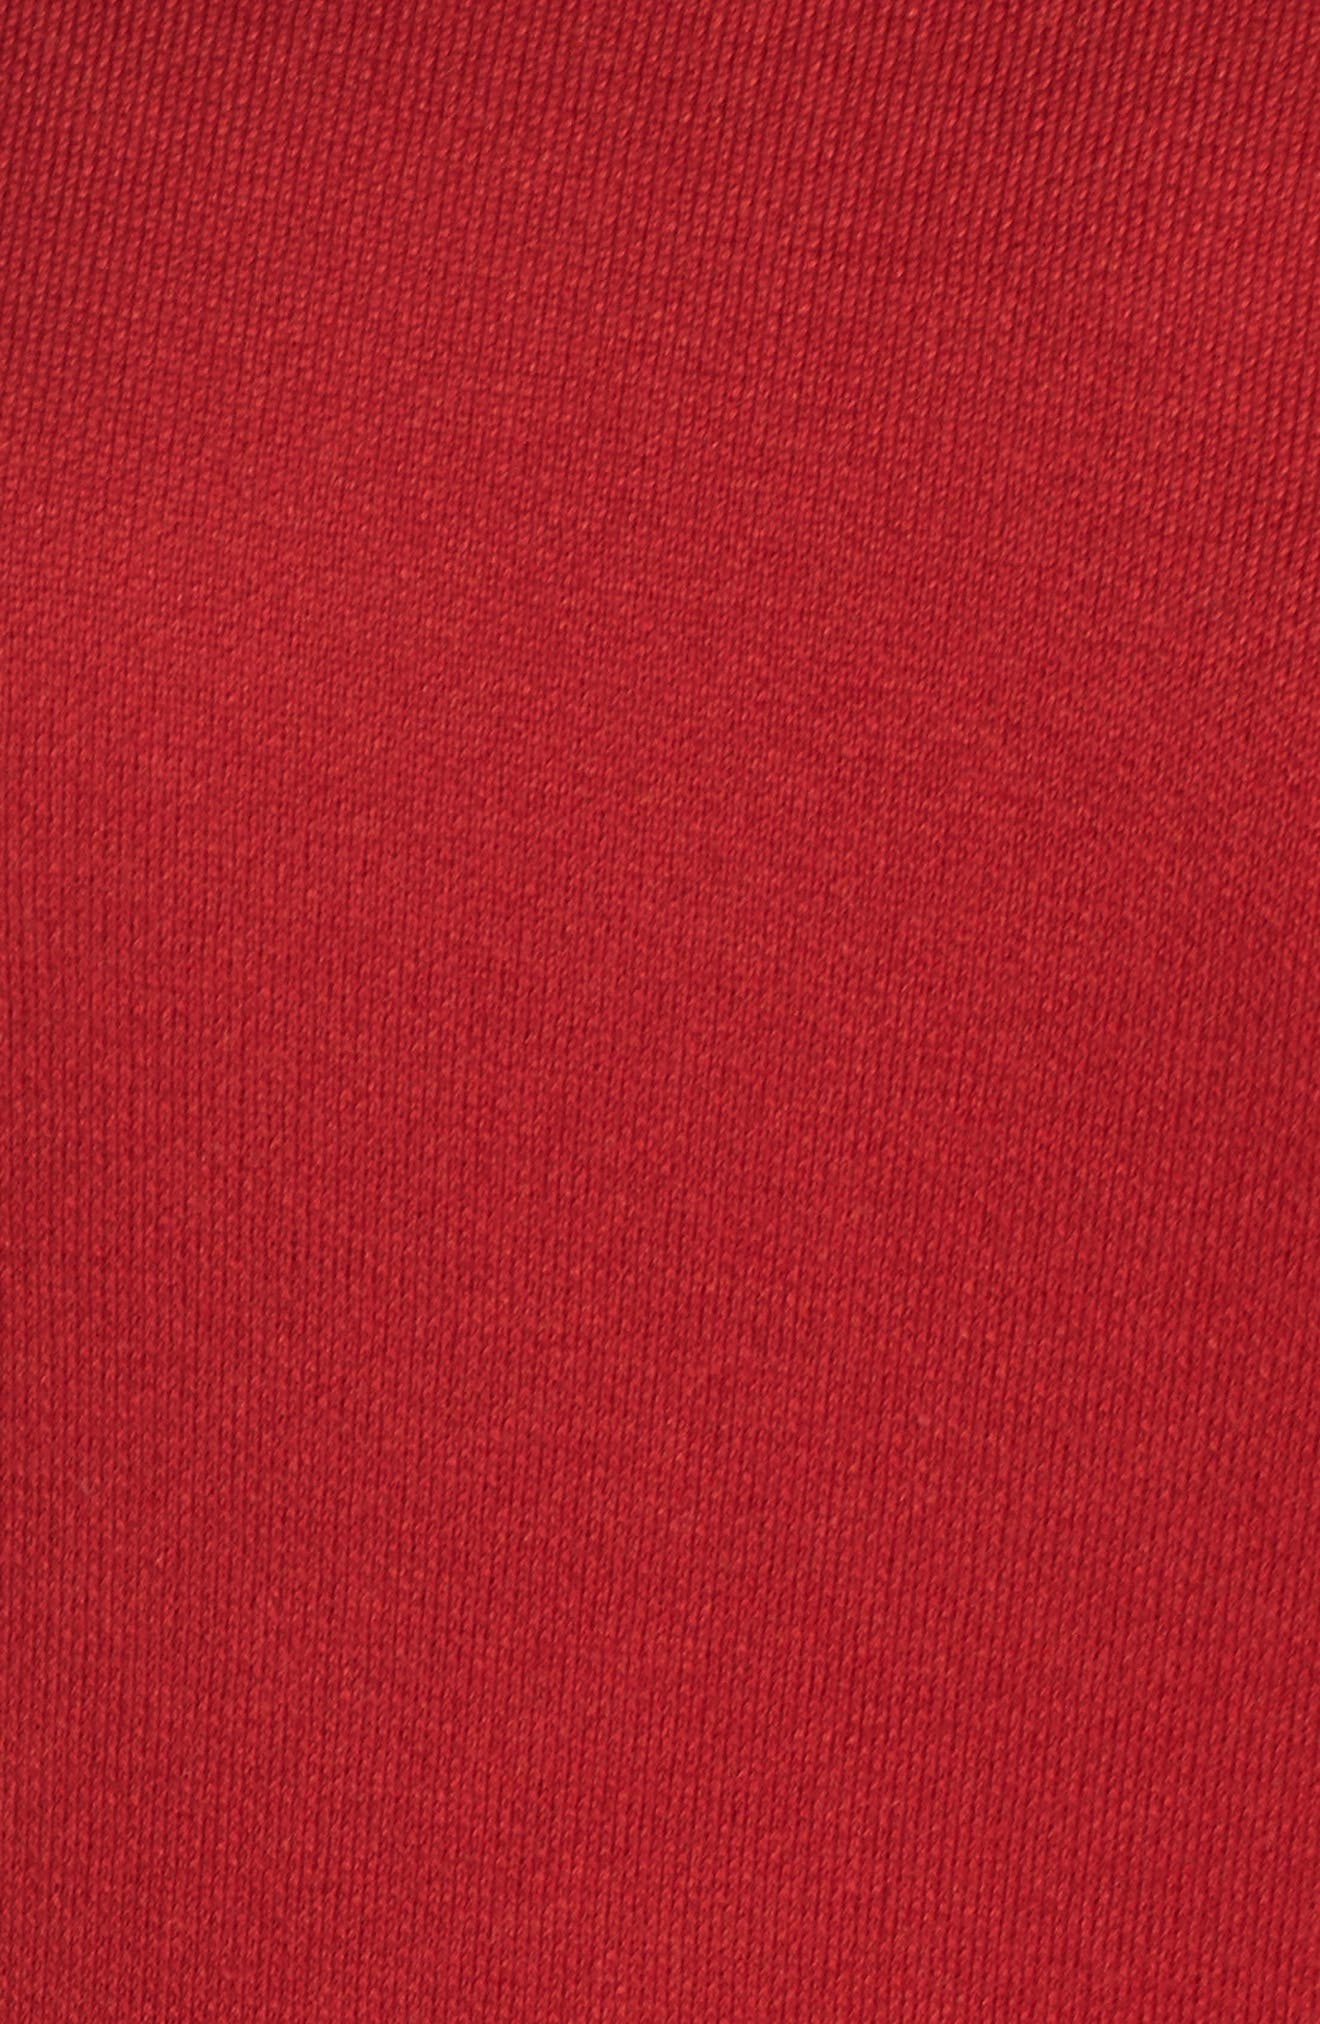 Dolman Sleeve Crewneck Sweater,                             Alternate thumbnail 25, color,